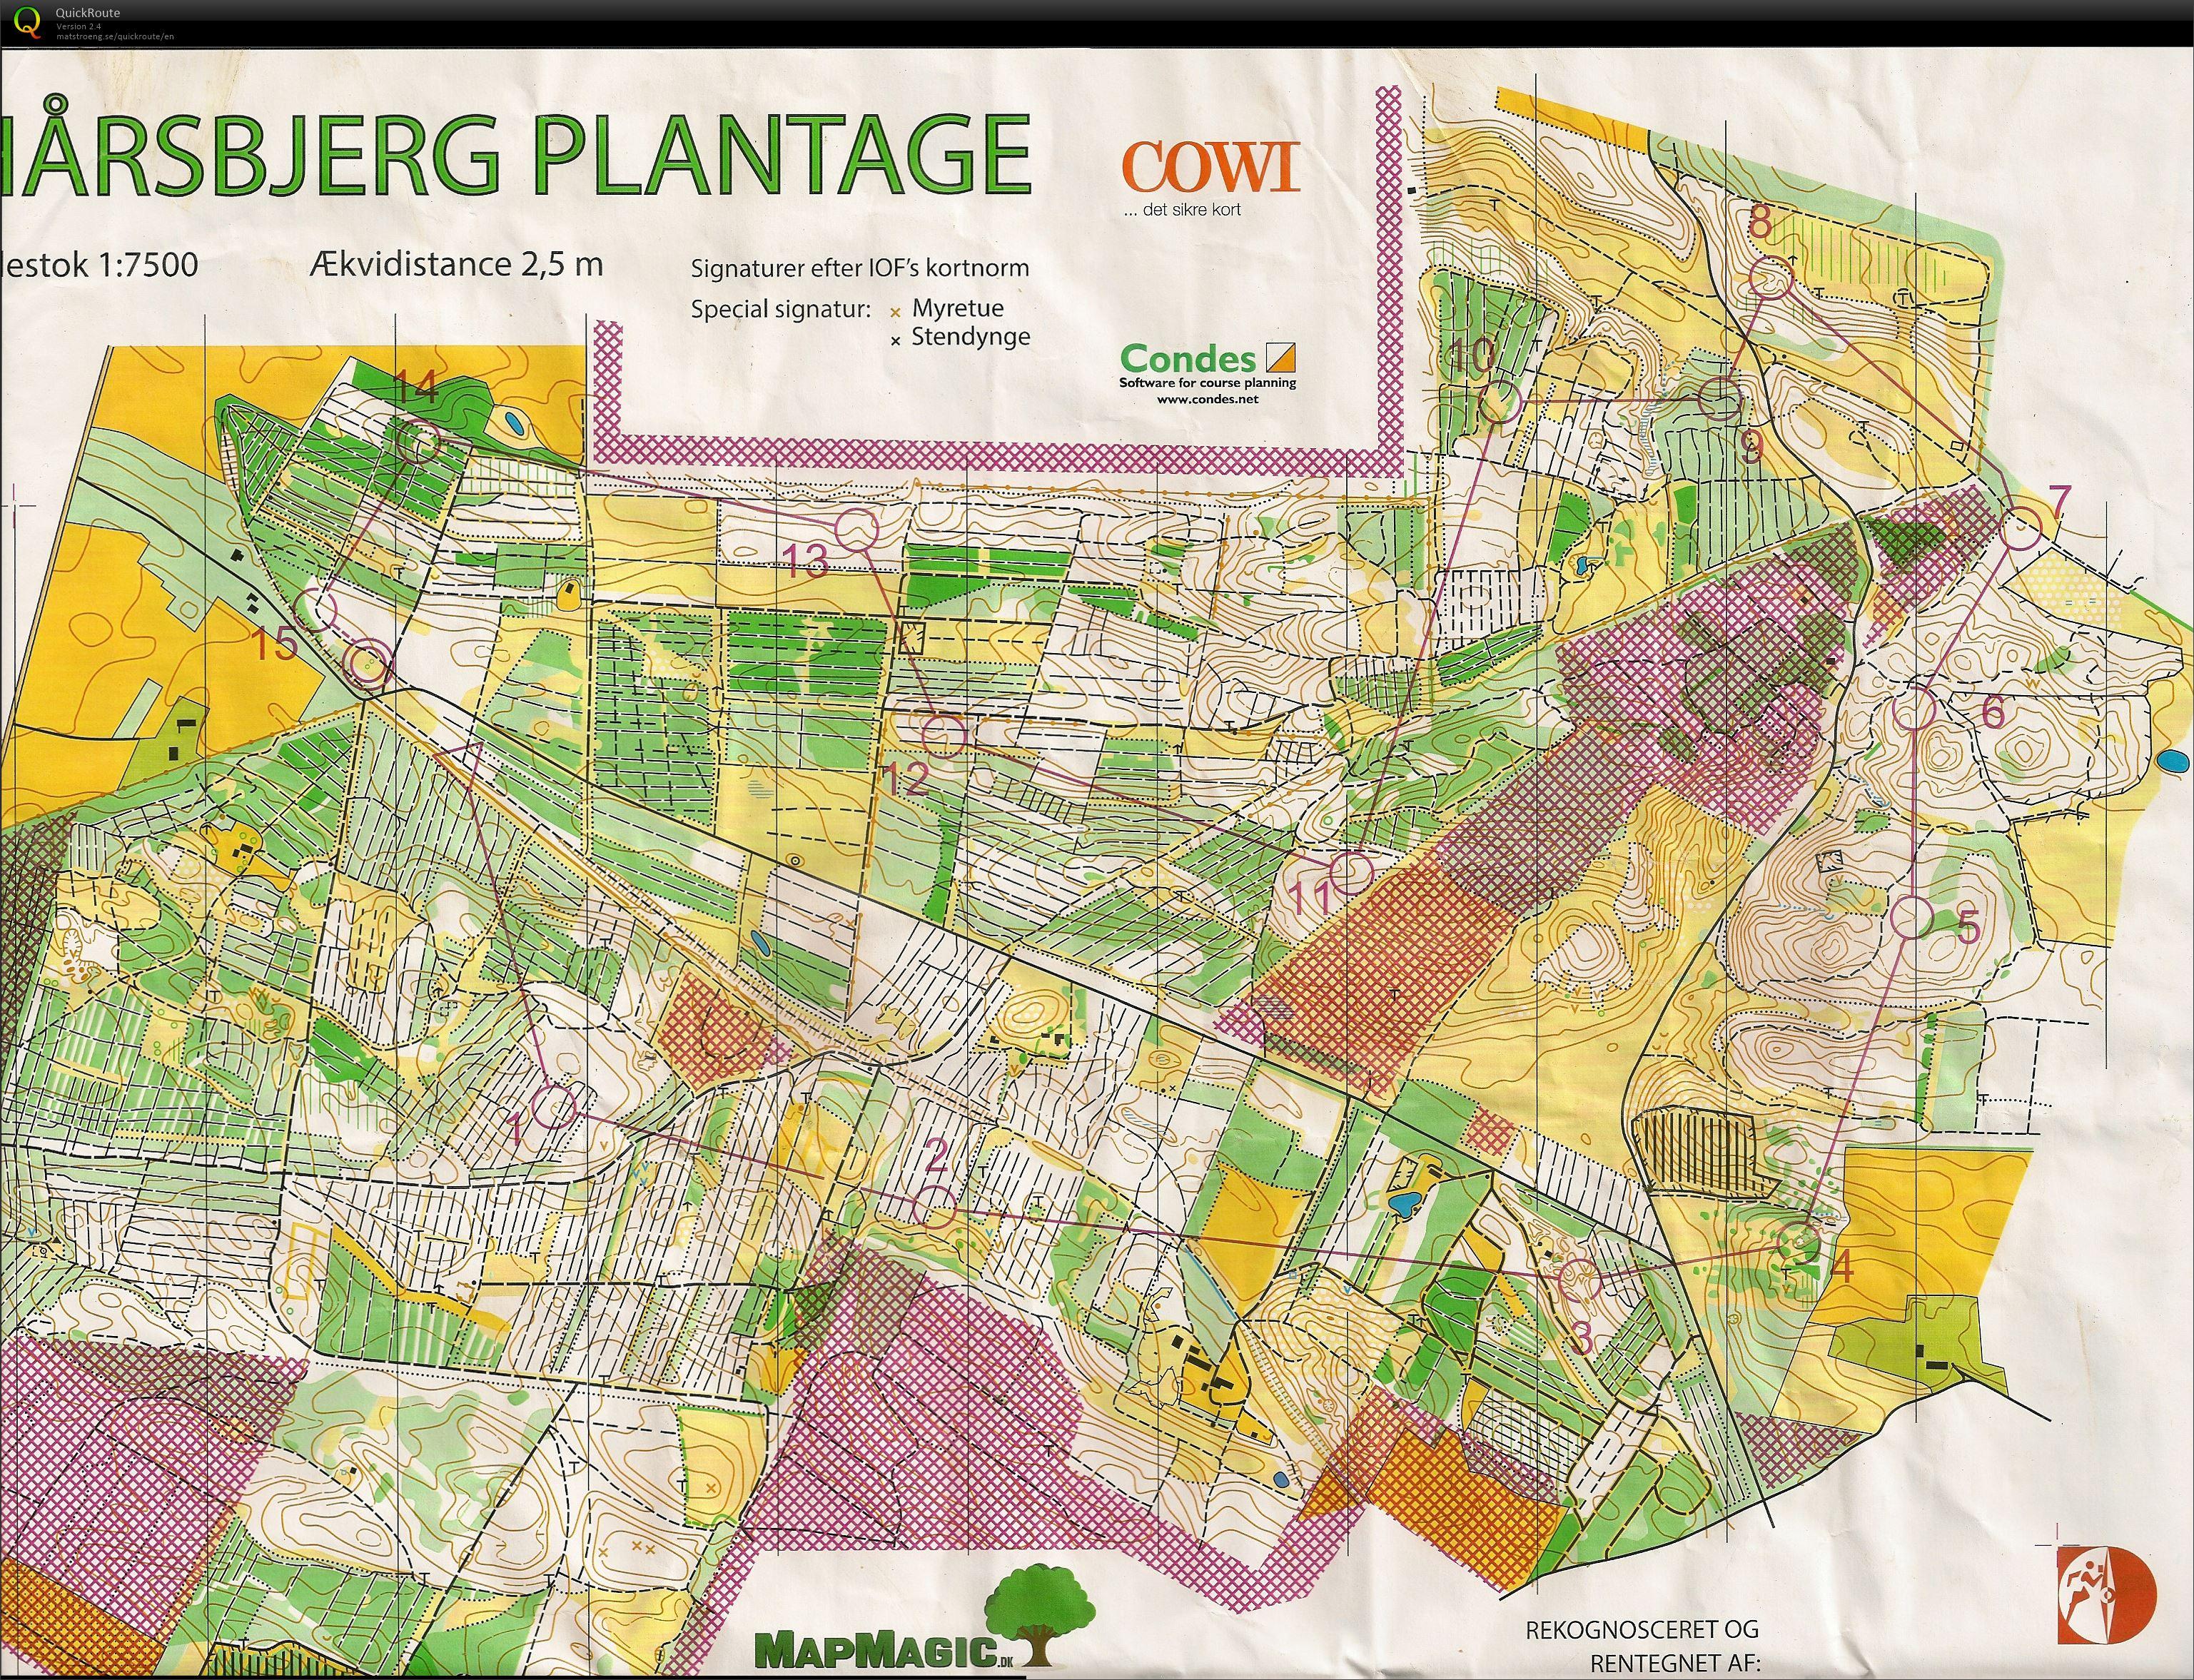 Jfm Lang H 60 August 19th 2018 Orienteering Map From Stig Barrett